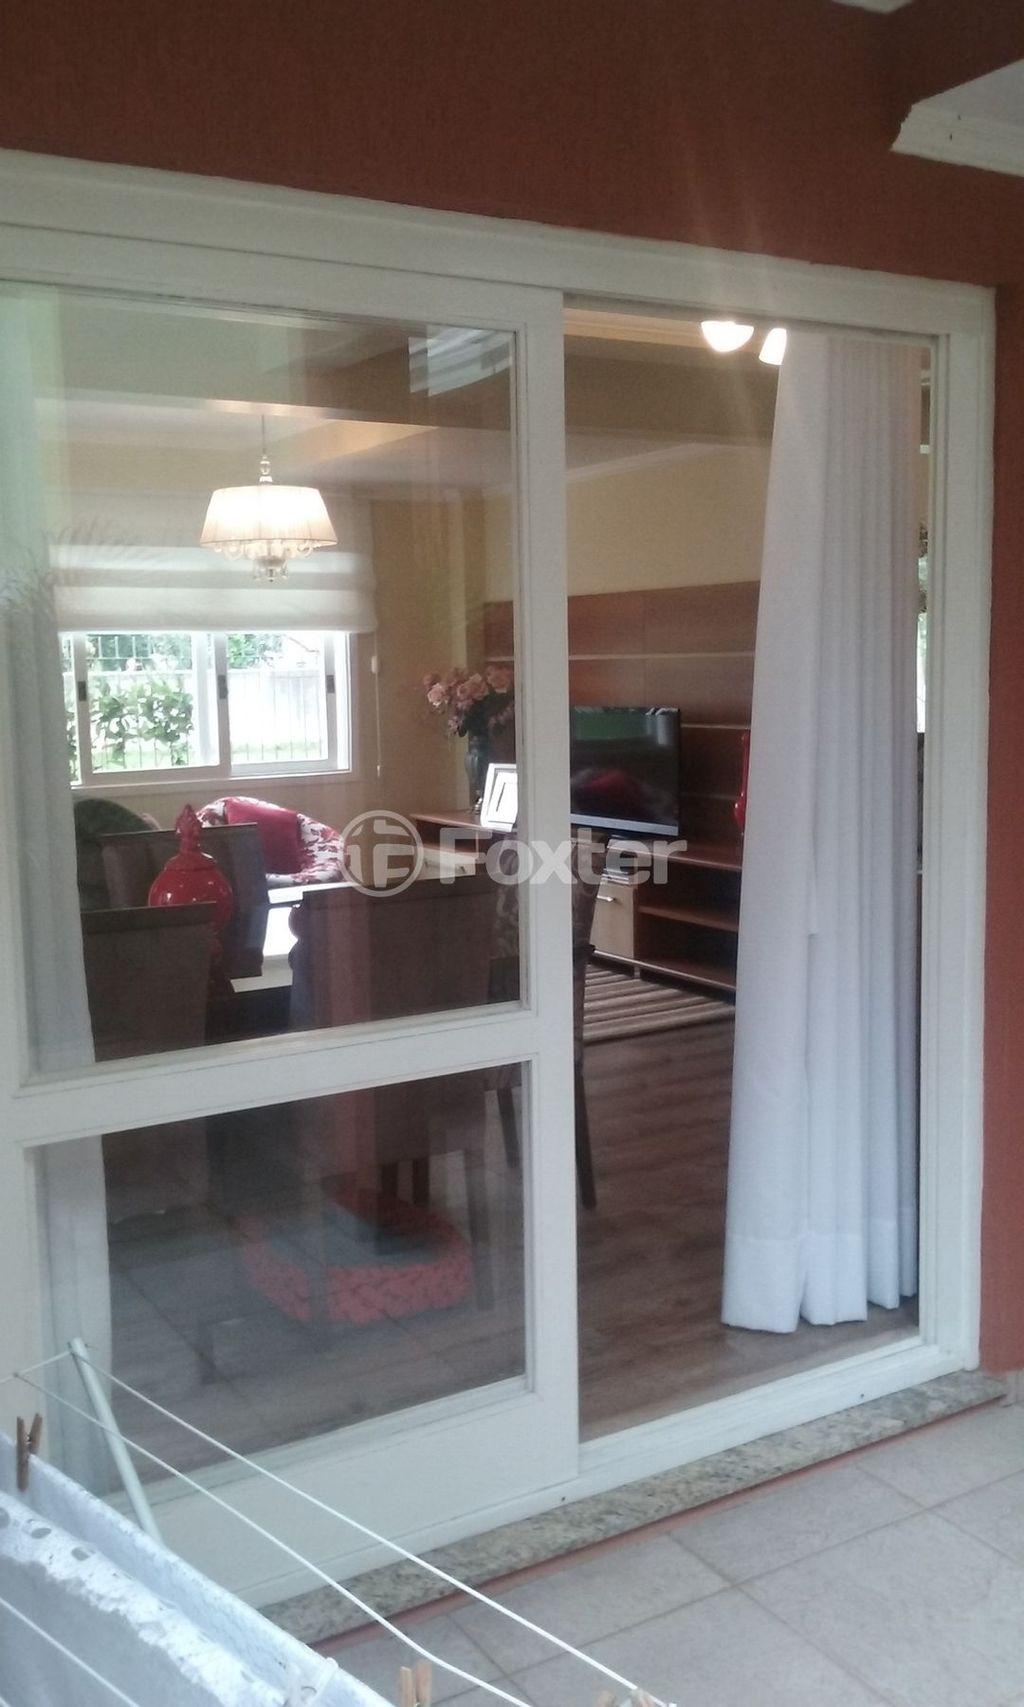 Casa 3 Dorm, Marechal Rondon, Canoas (137433) - Foto 12